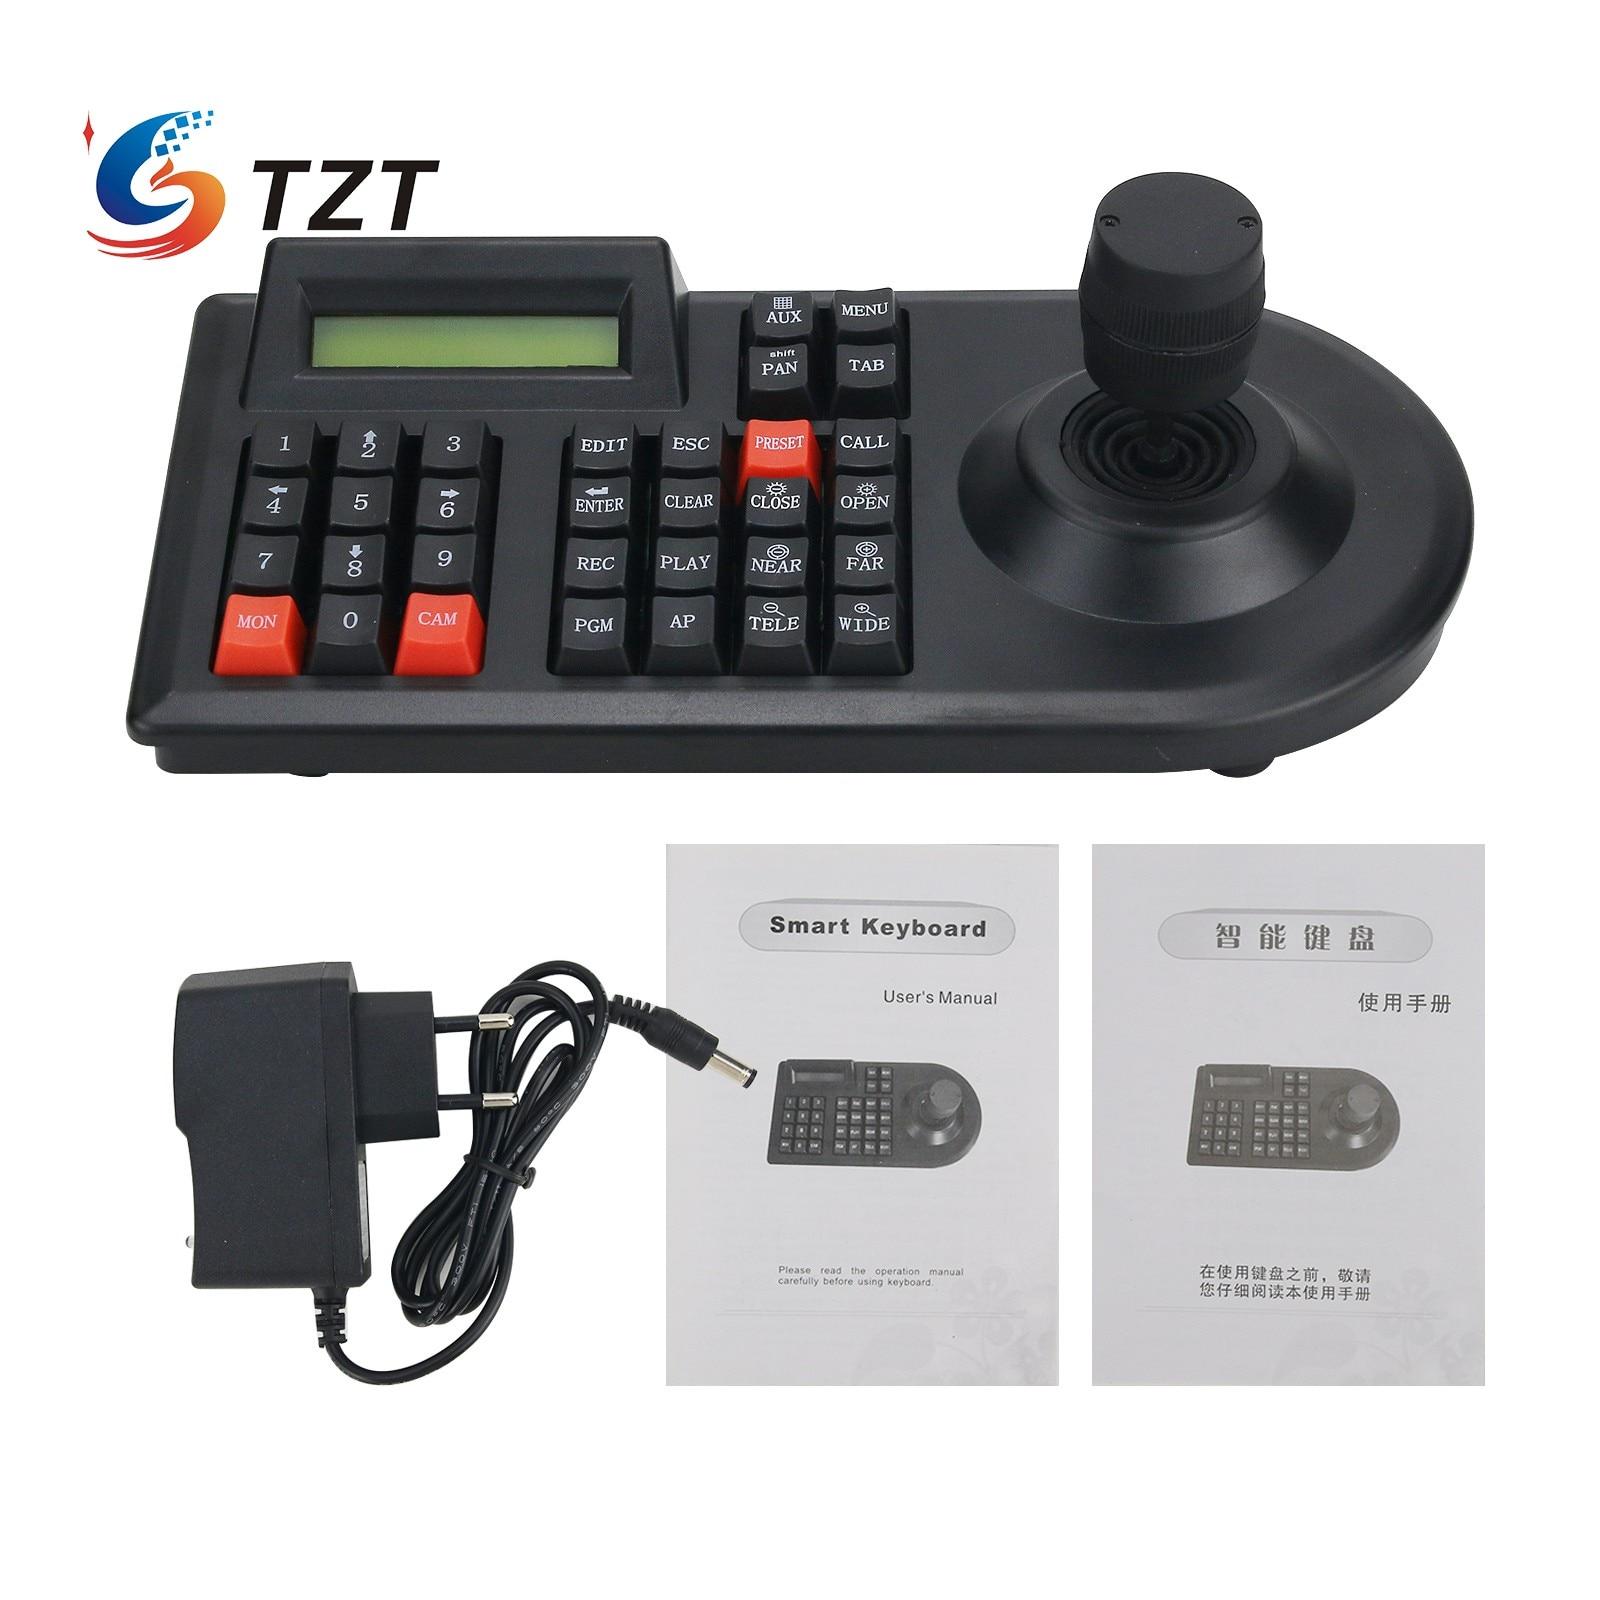 TZT ثلاثية الأبعاد عصا التحكم PTZ لوحة المفاتيح 9VDC للحصول على كاميرا تلفزيونات الدوائر المغلقة Dom RS485 التحكم PTS3103C